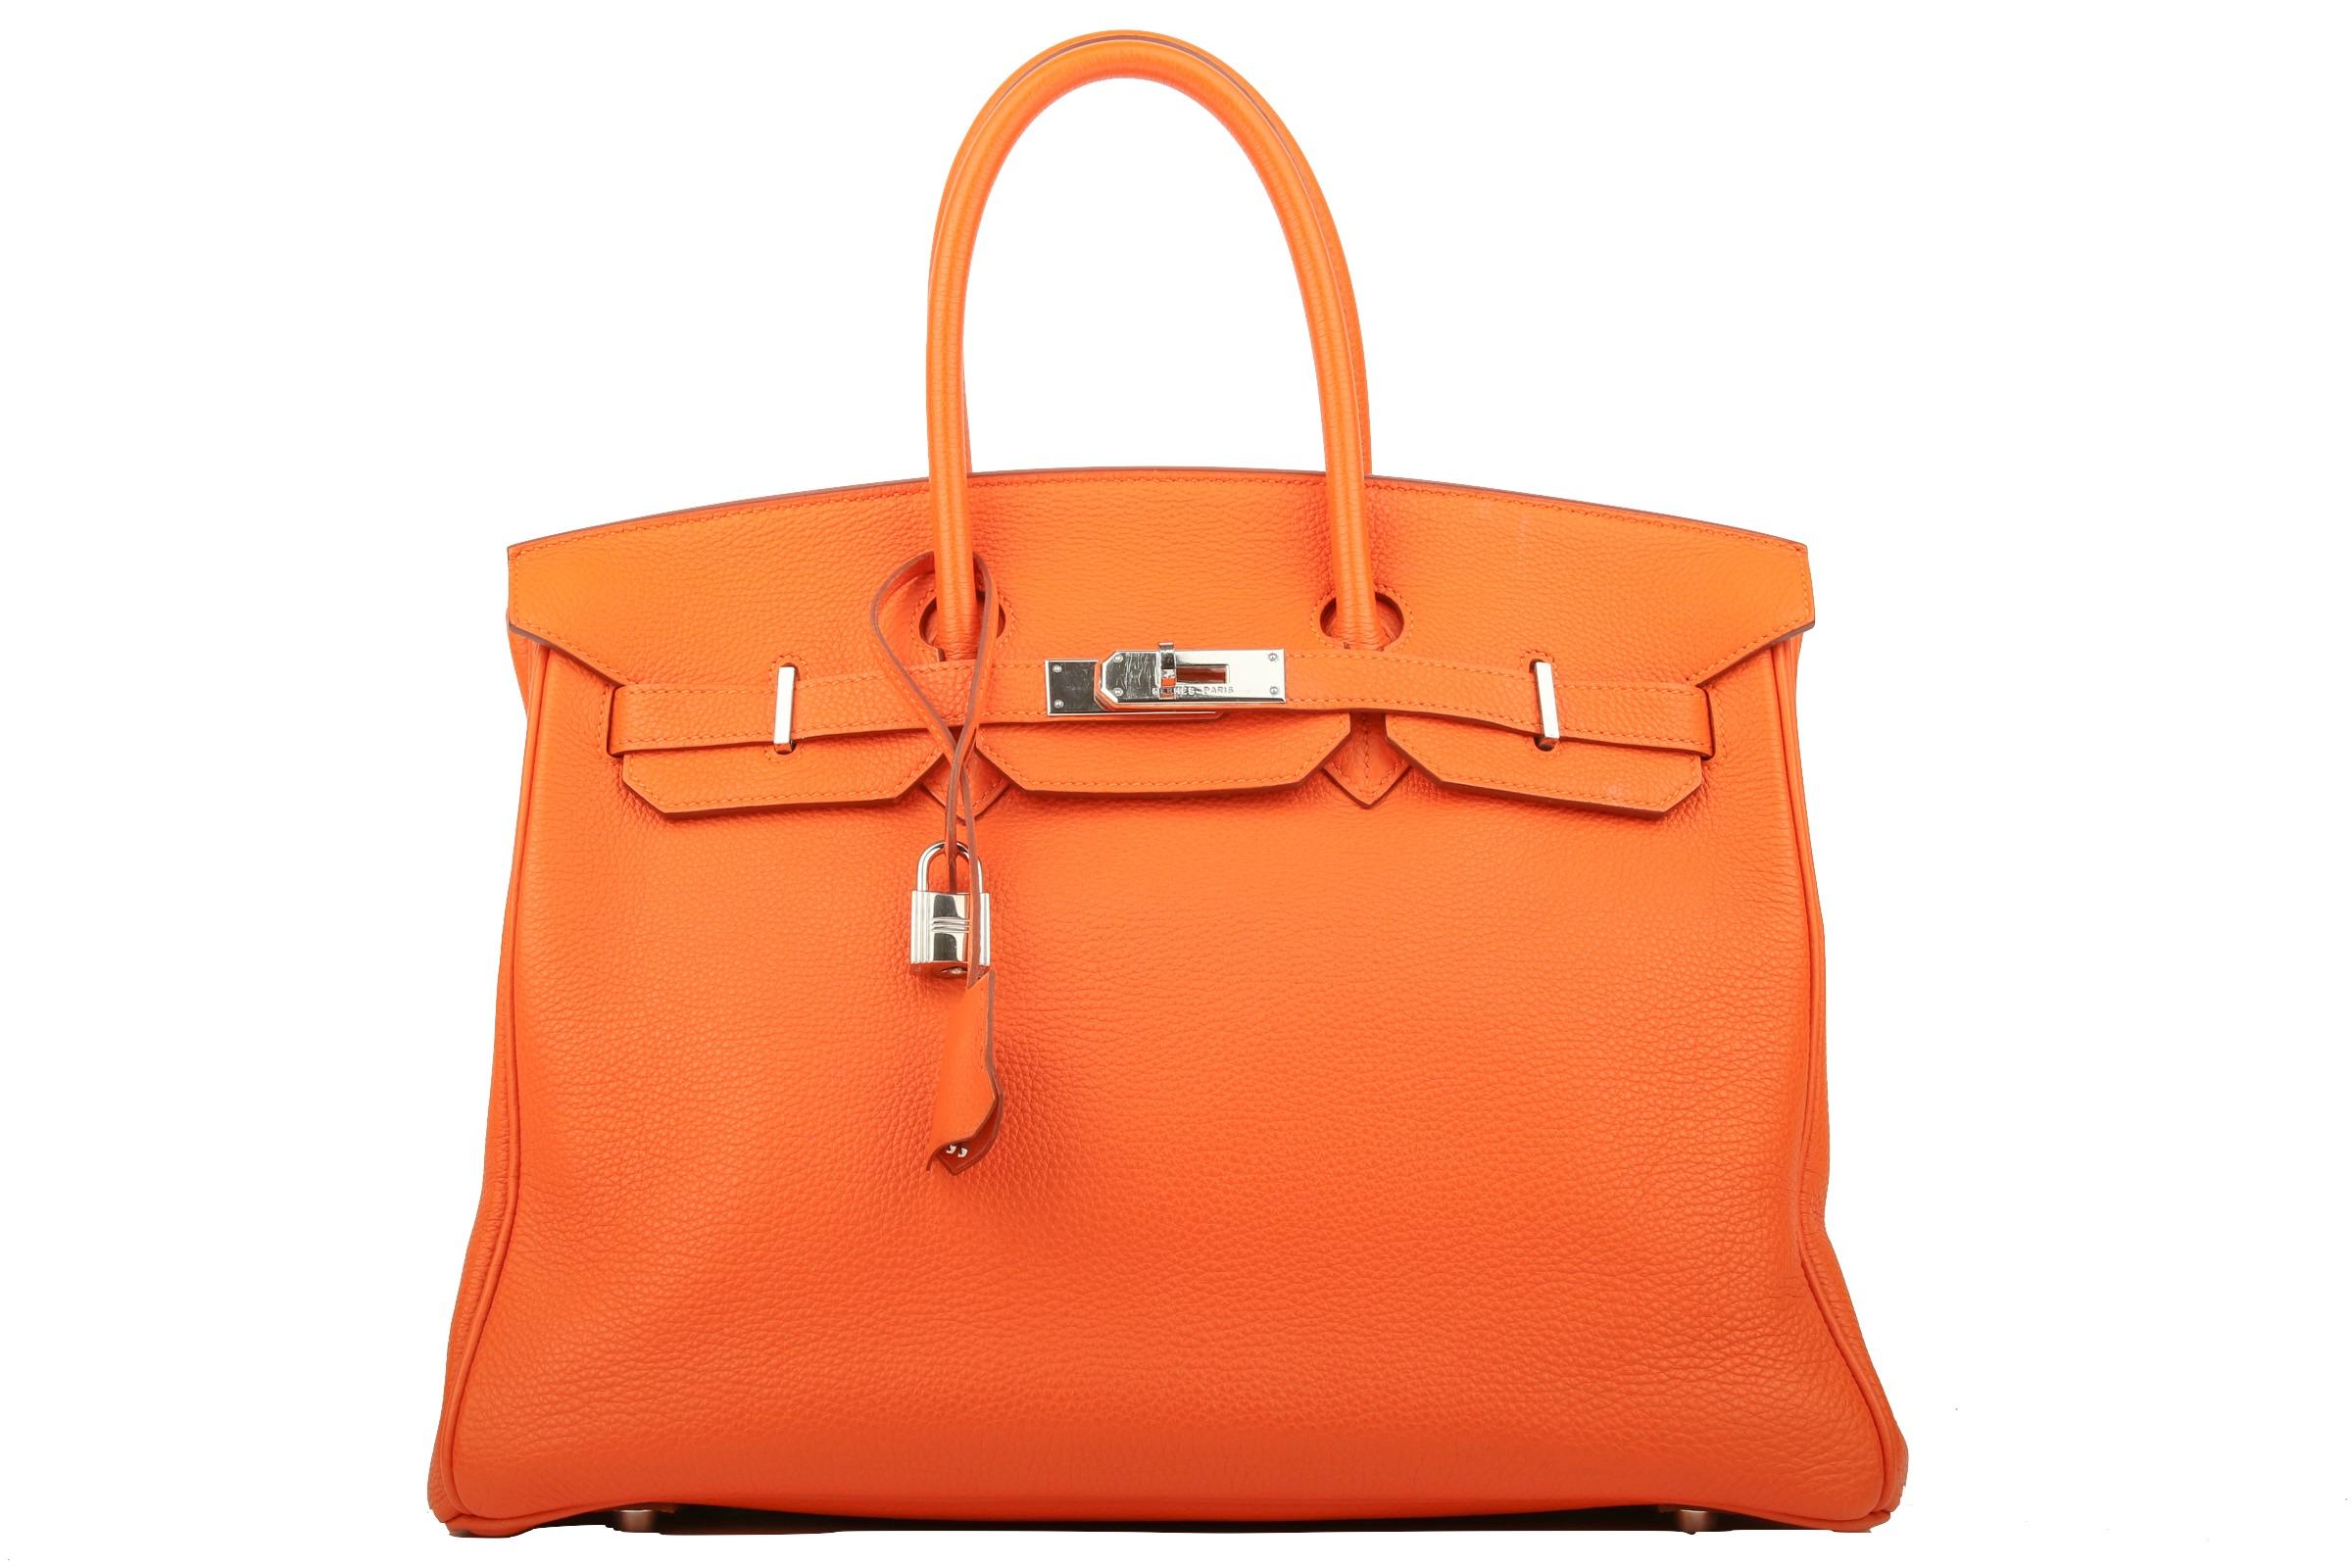 30e65ed7ed Hermès Birkin 35 Orange Togo leather | Luxussachen.com